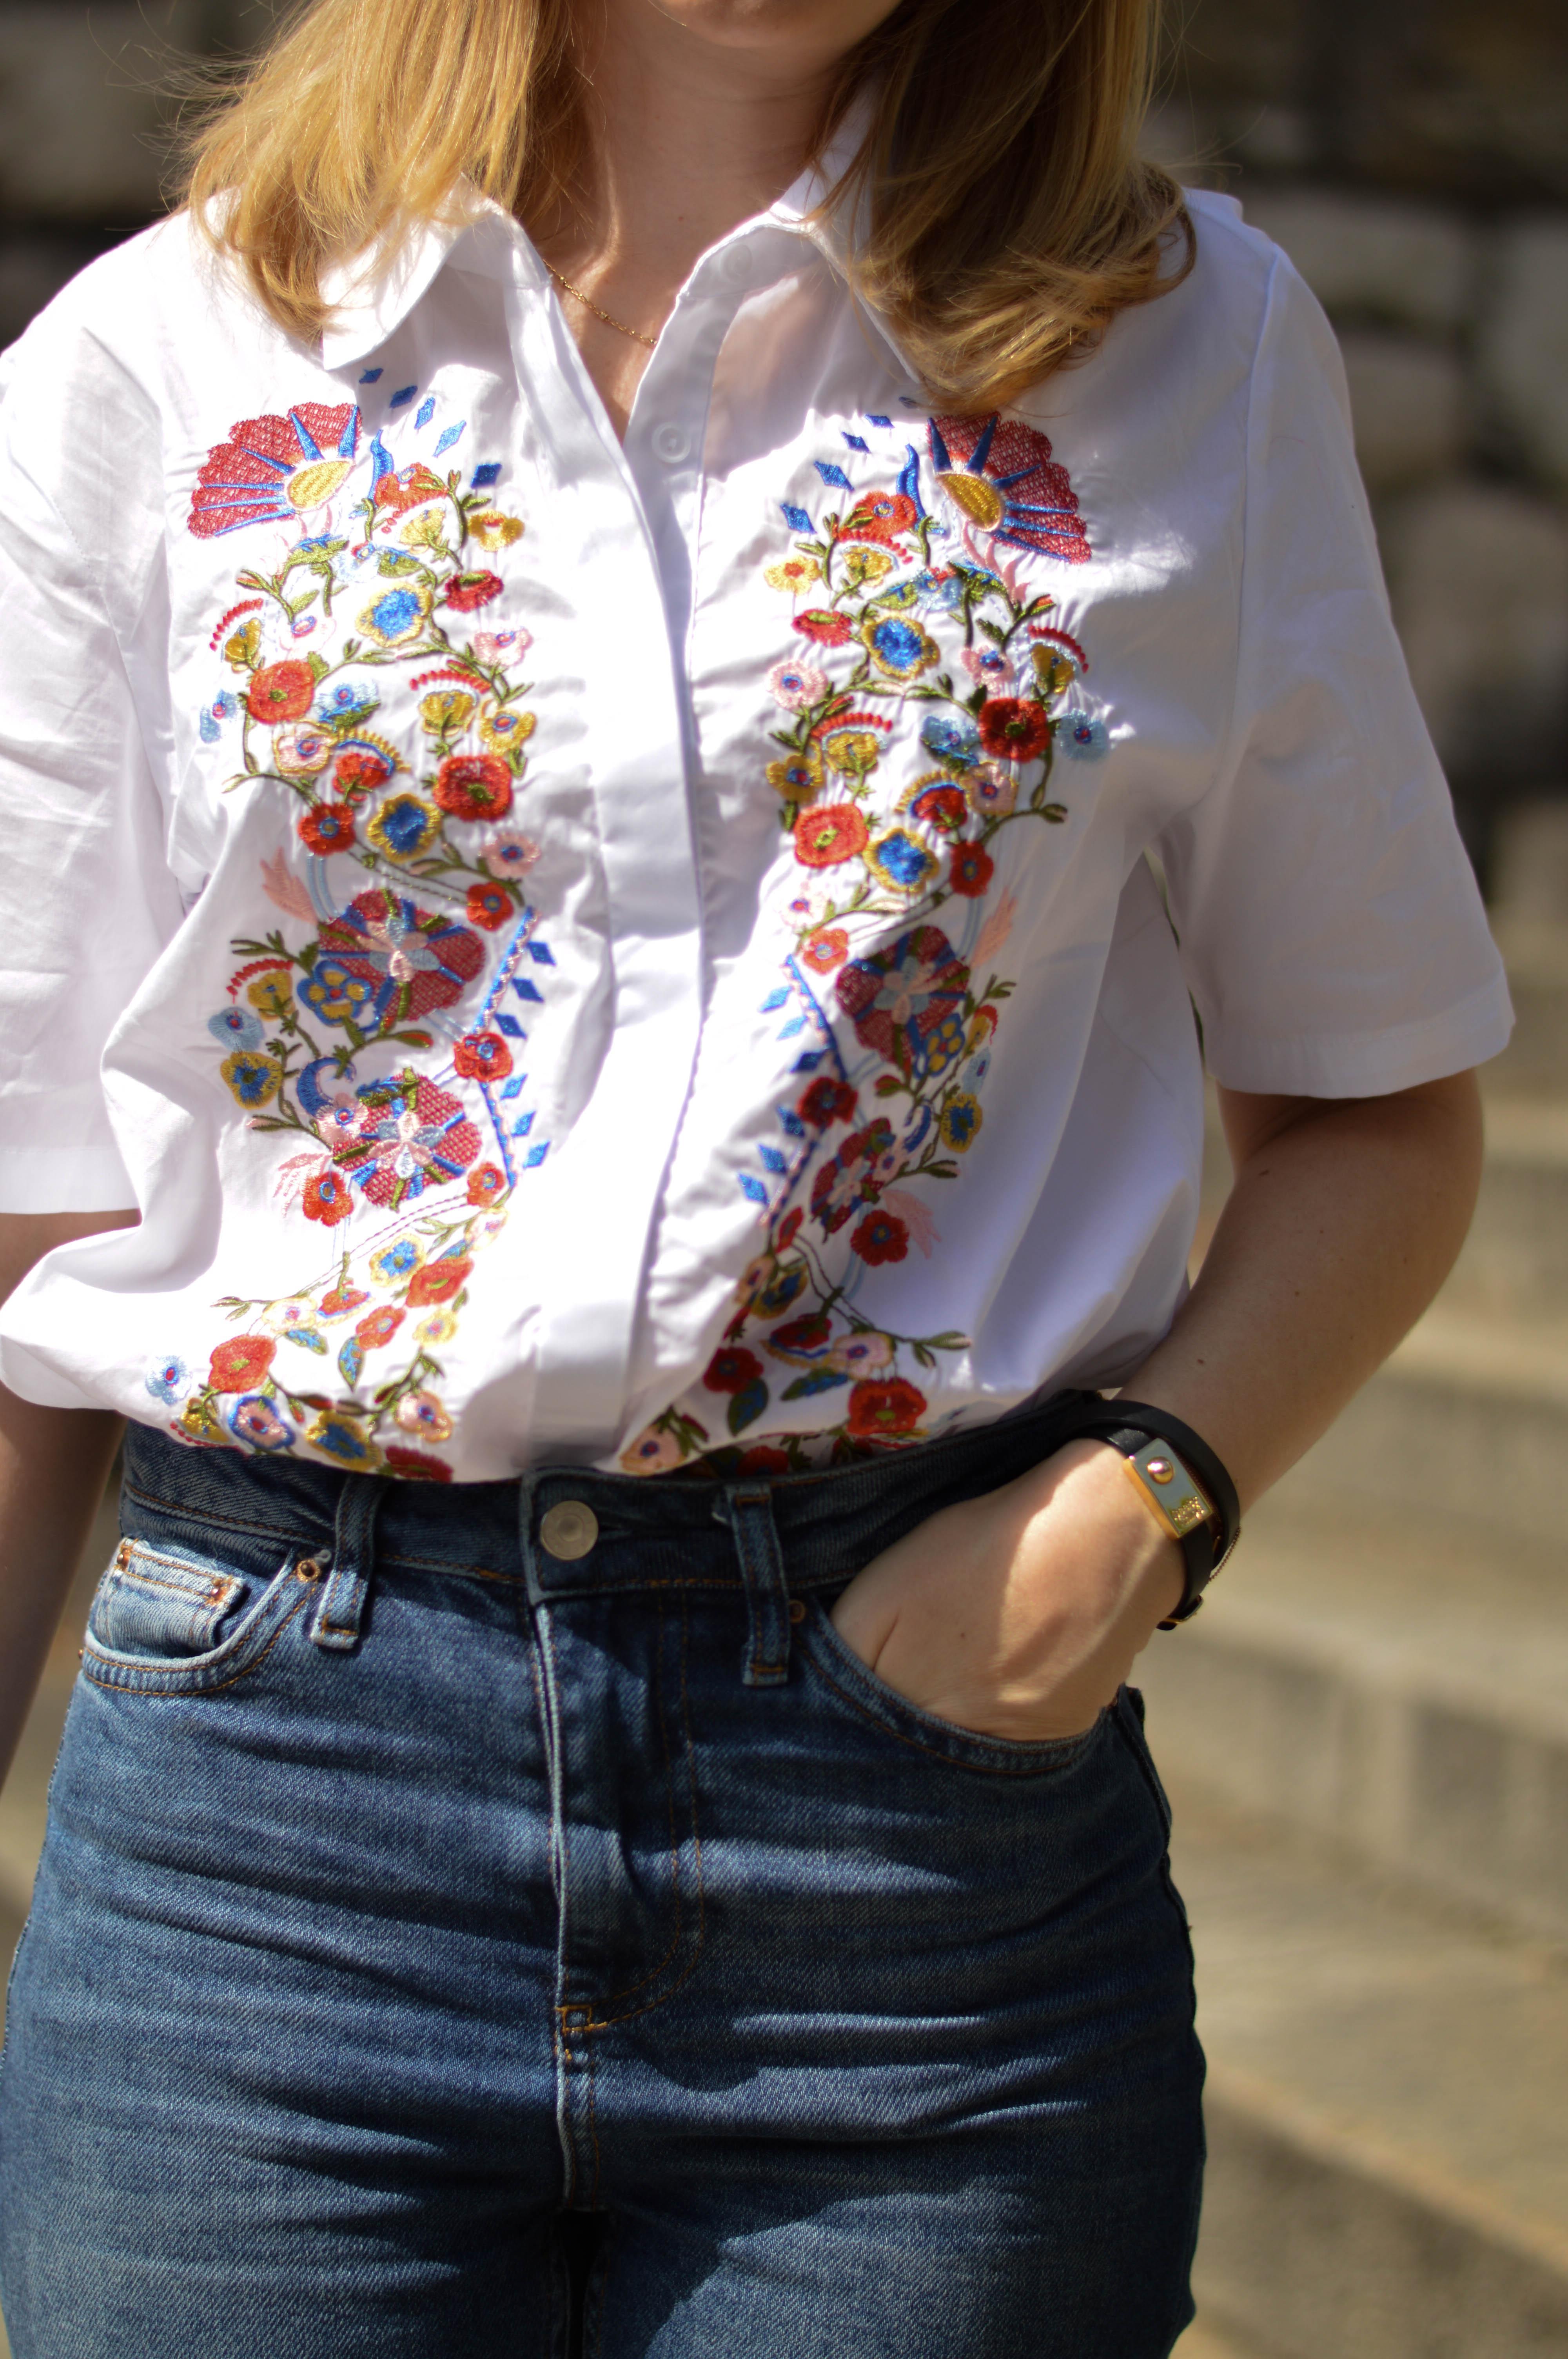 chemise brodee glamorous zalando 4